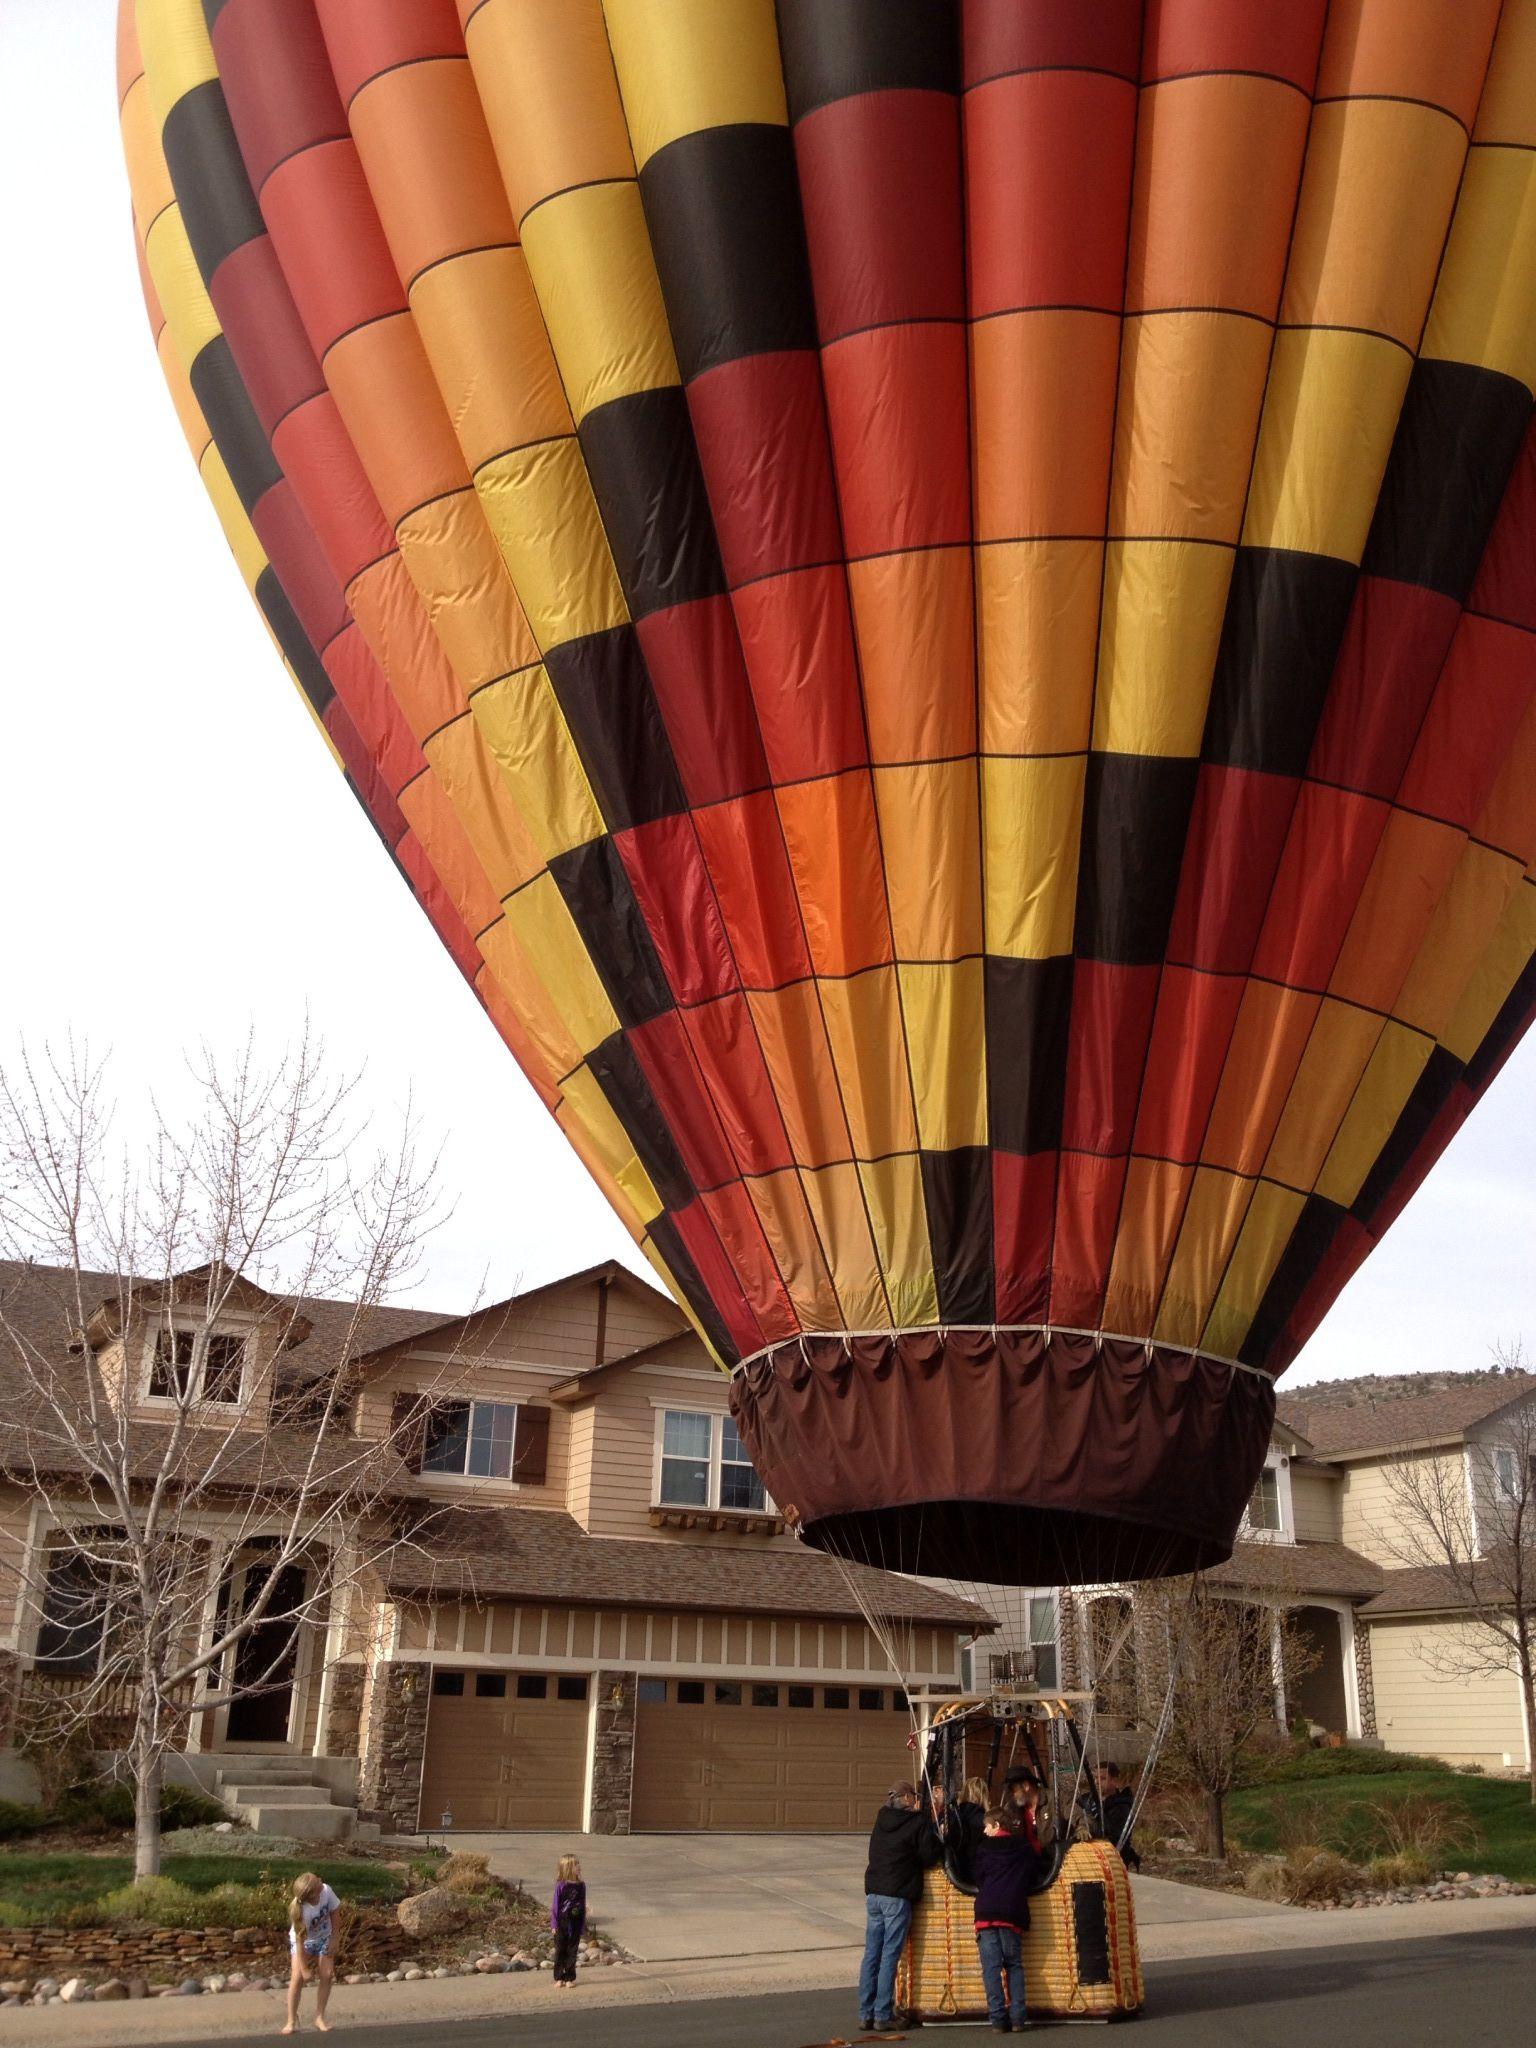 Neighborhood hotair balloon drop in! Hot air balloon